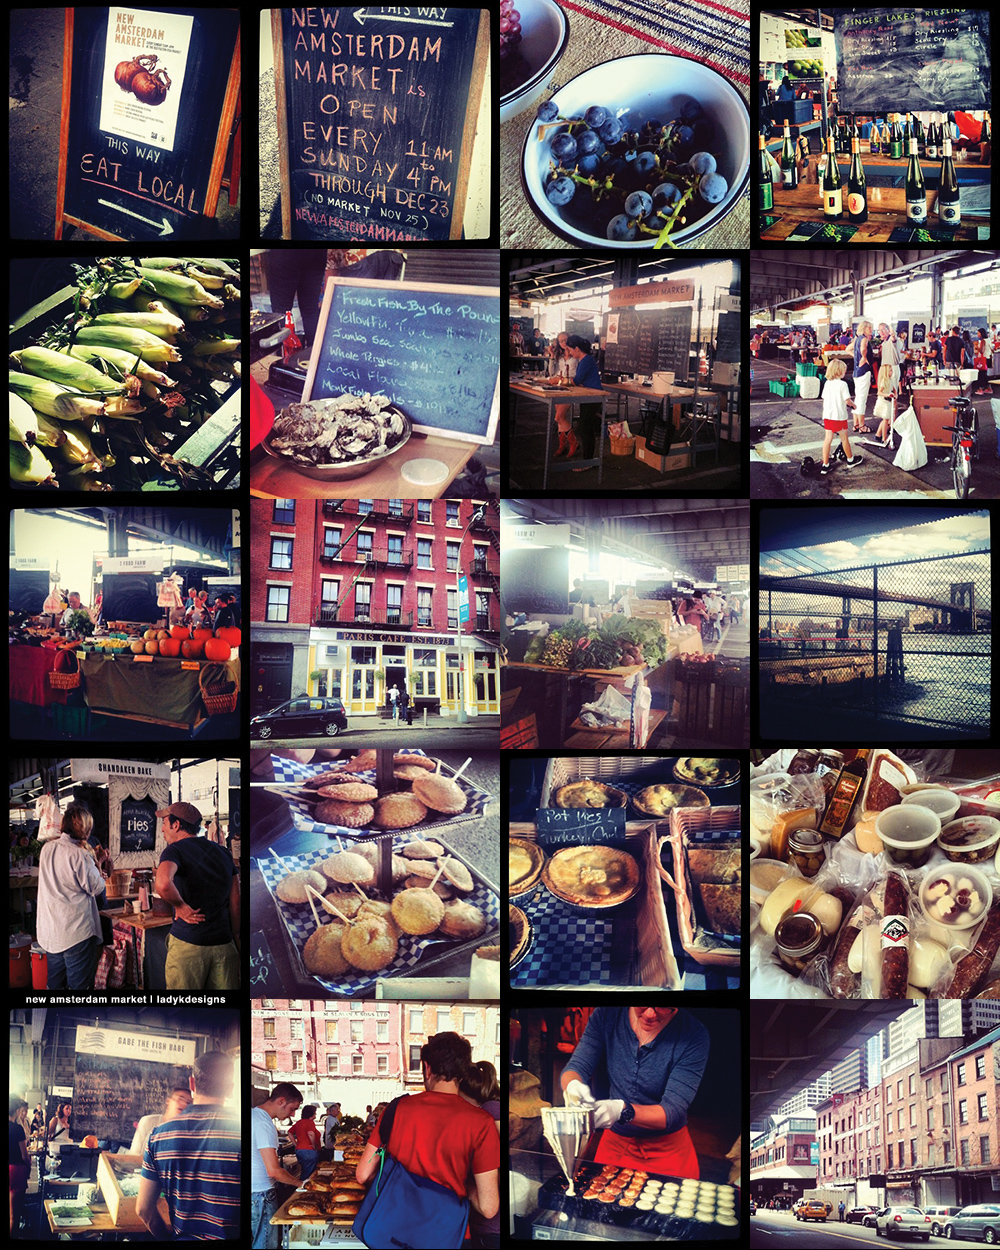 New Amsterdam Market, New York City